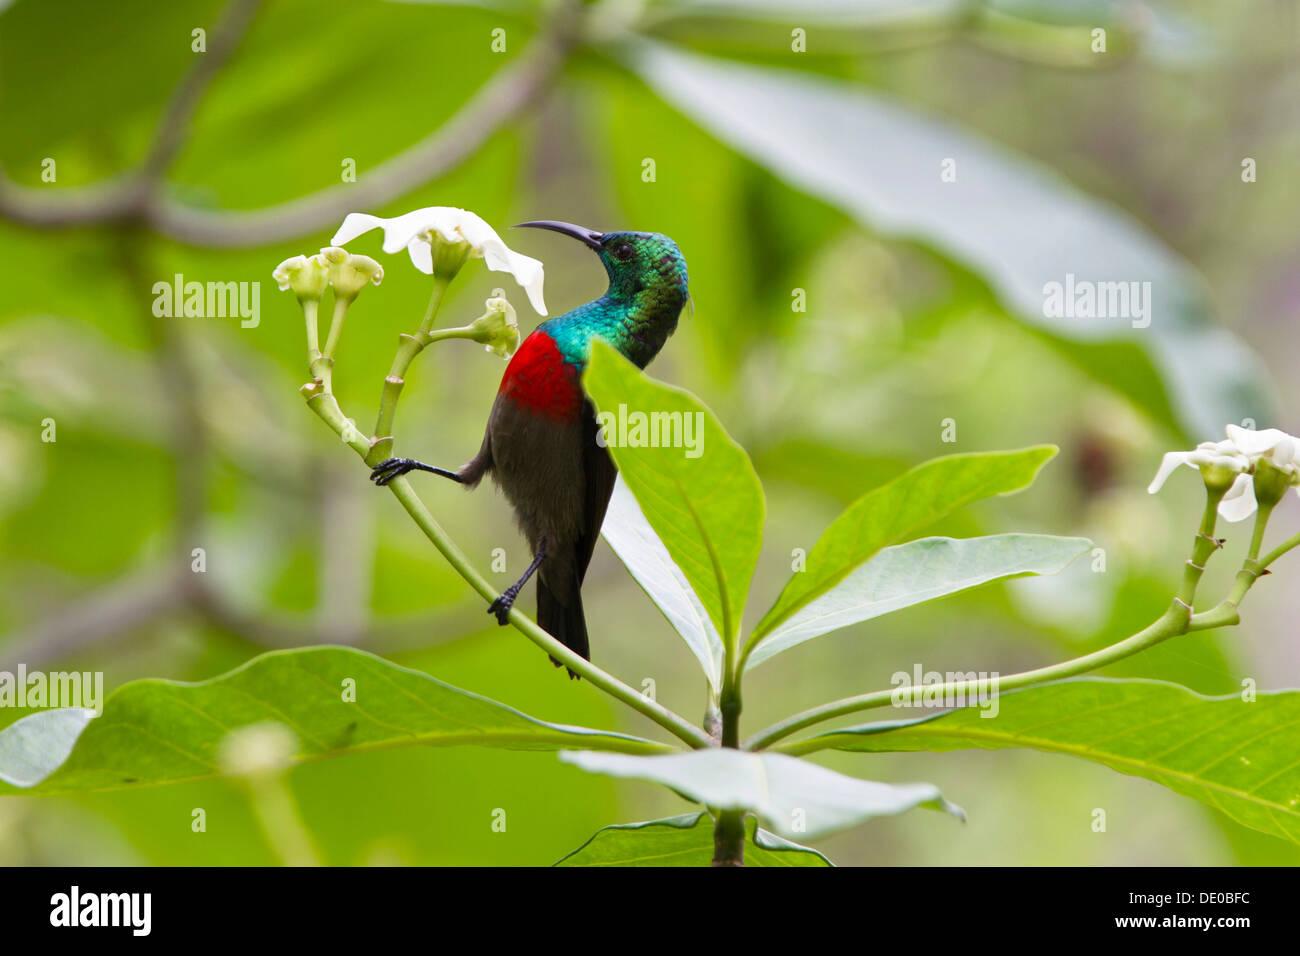 Olive-bellied Sunbird (Cinnyris chloropygia) - Stock Image